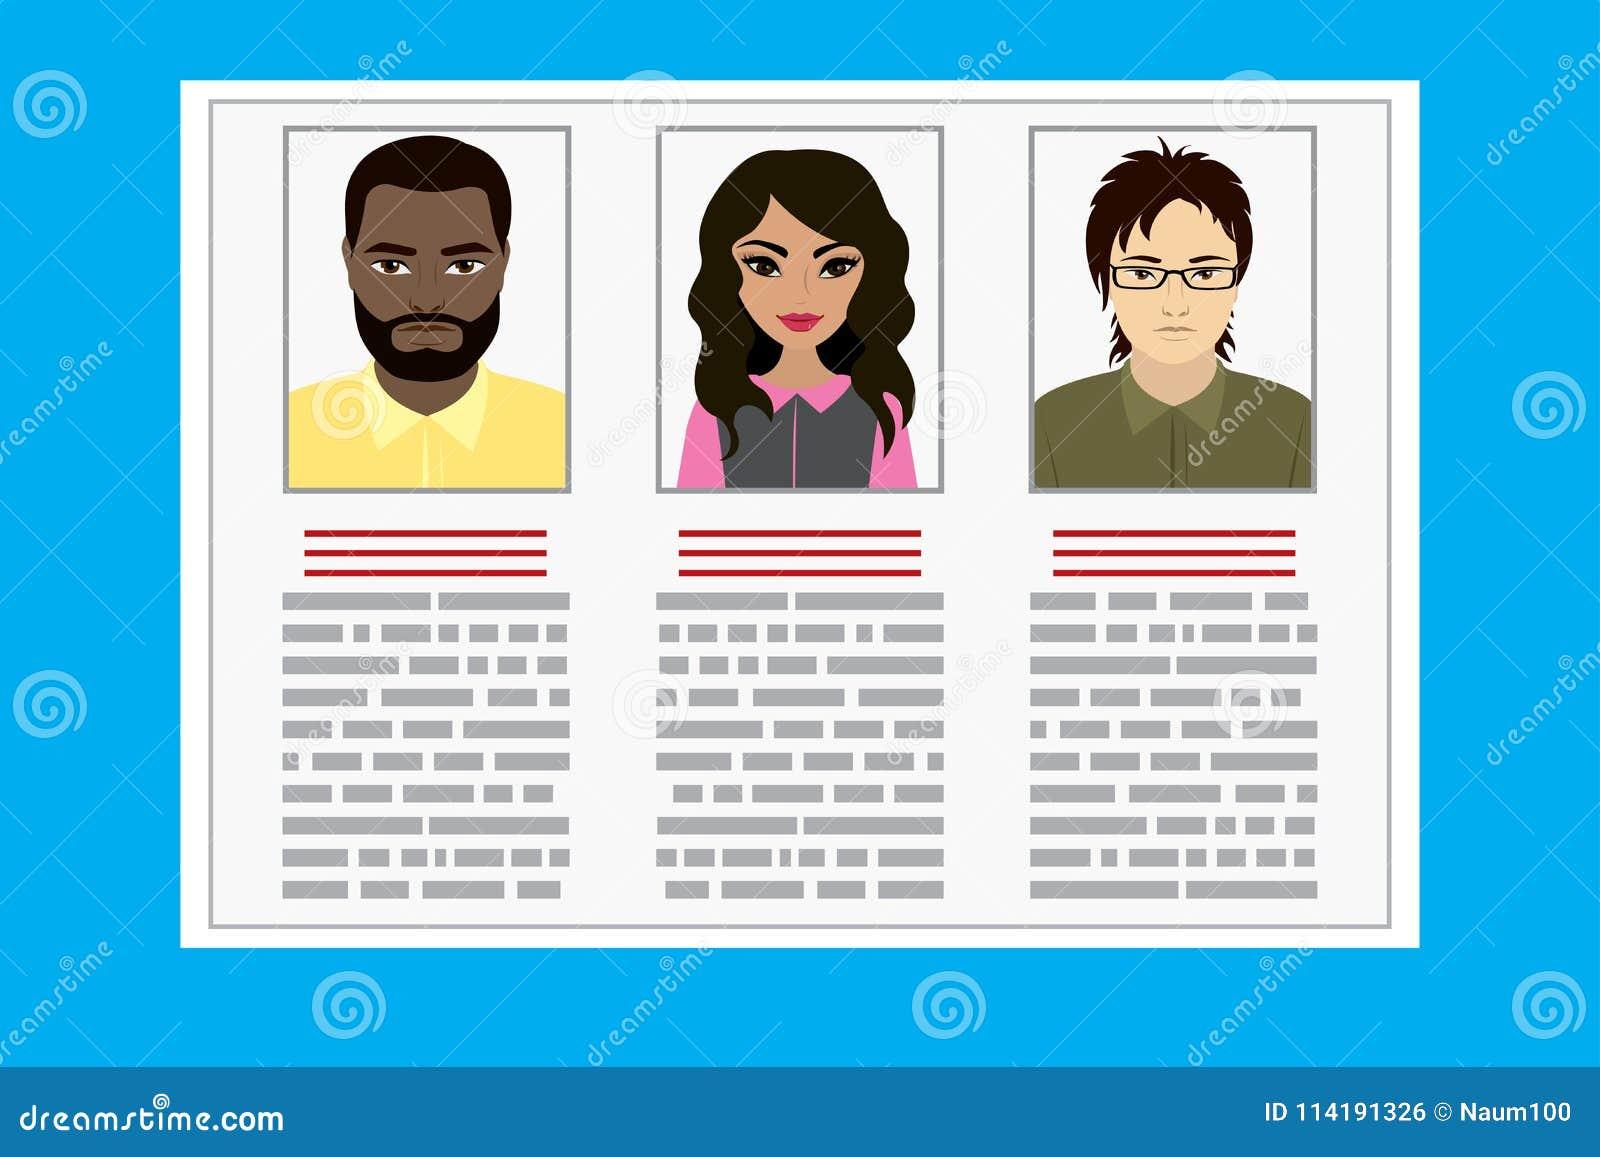 Curriculum Vitae Recruitment Candidate Job Position Stock Vector